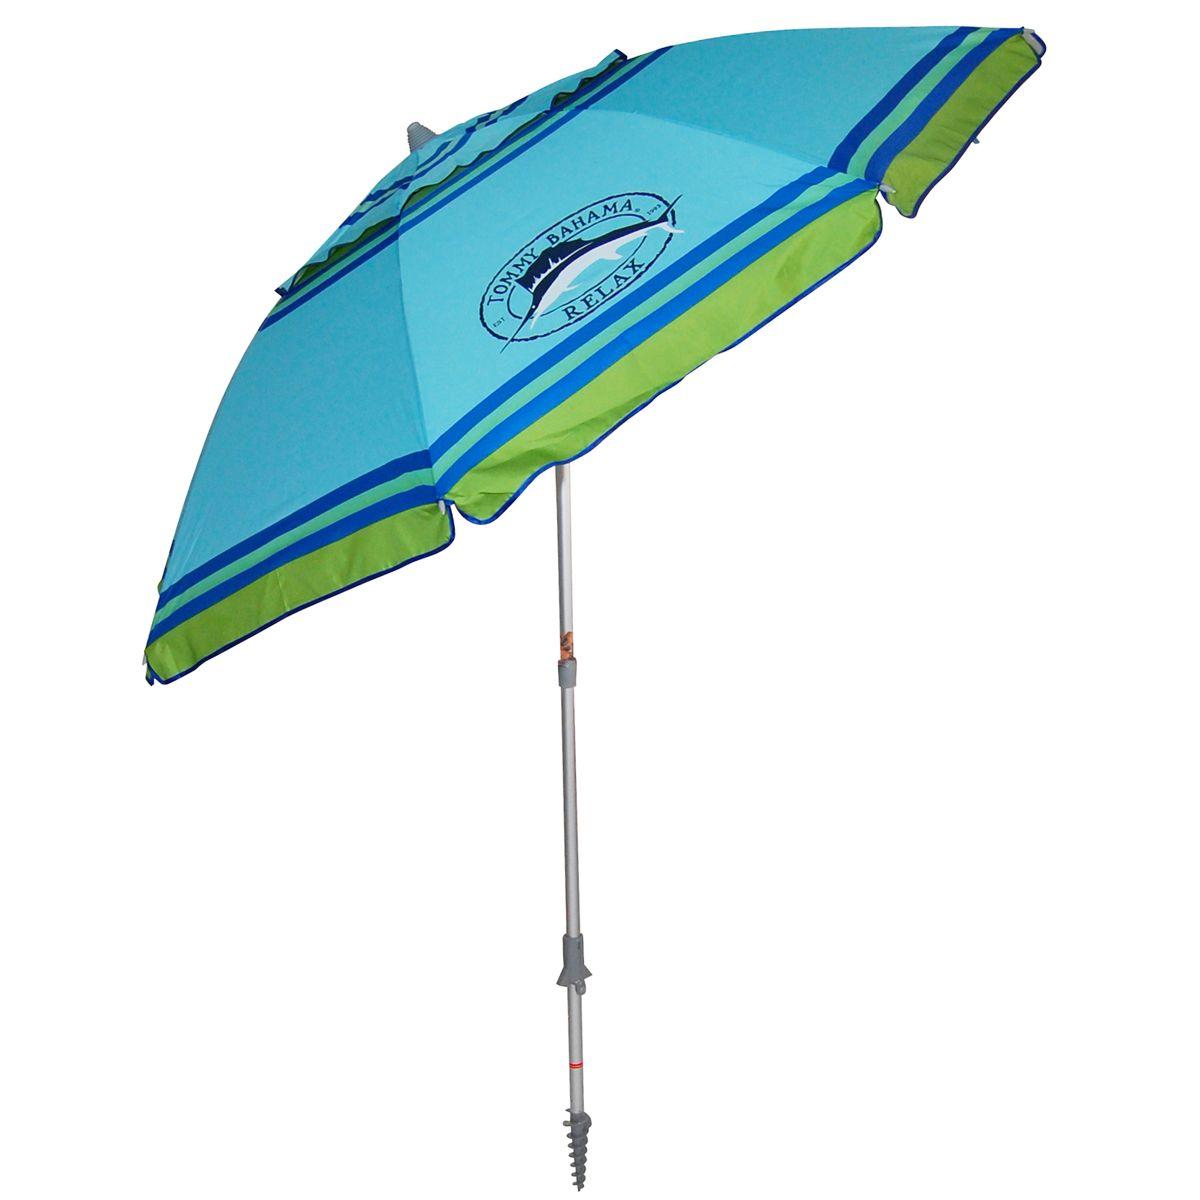 Tommy Bahama 7 Ft Vented Aluminum Beach Umbrella W Built In Sand